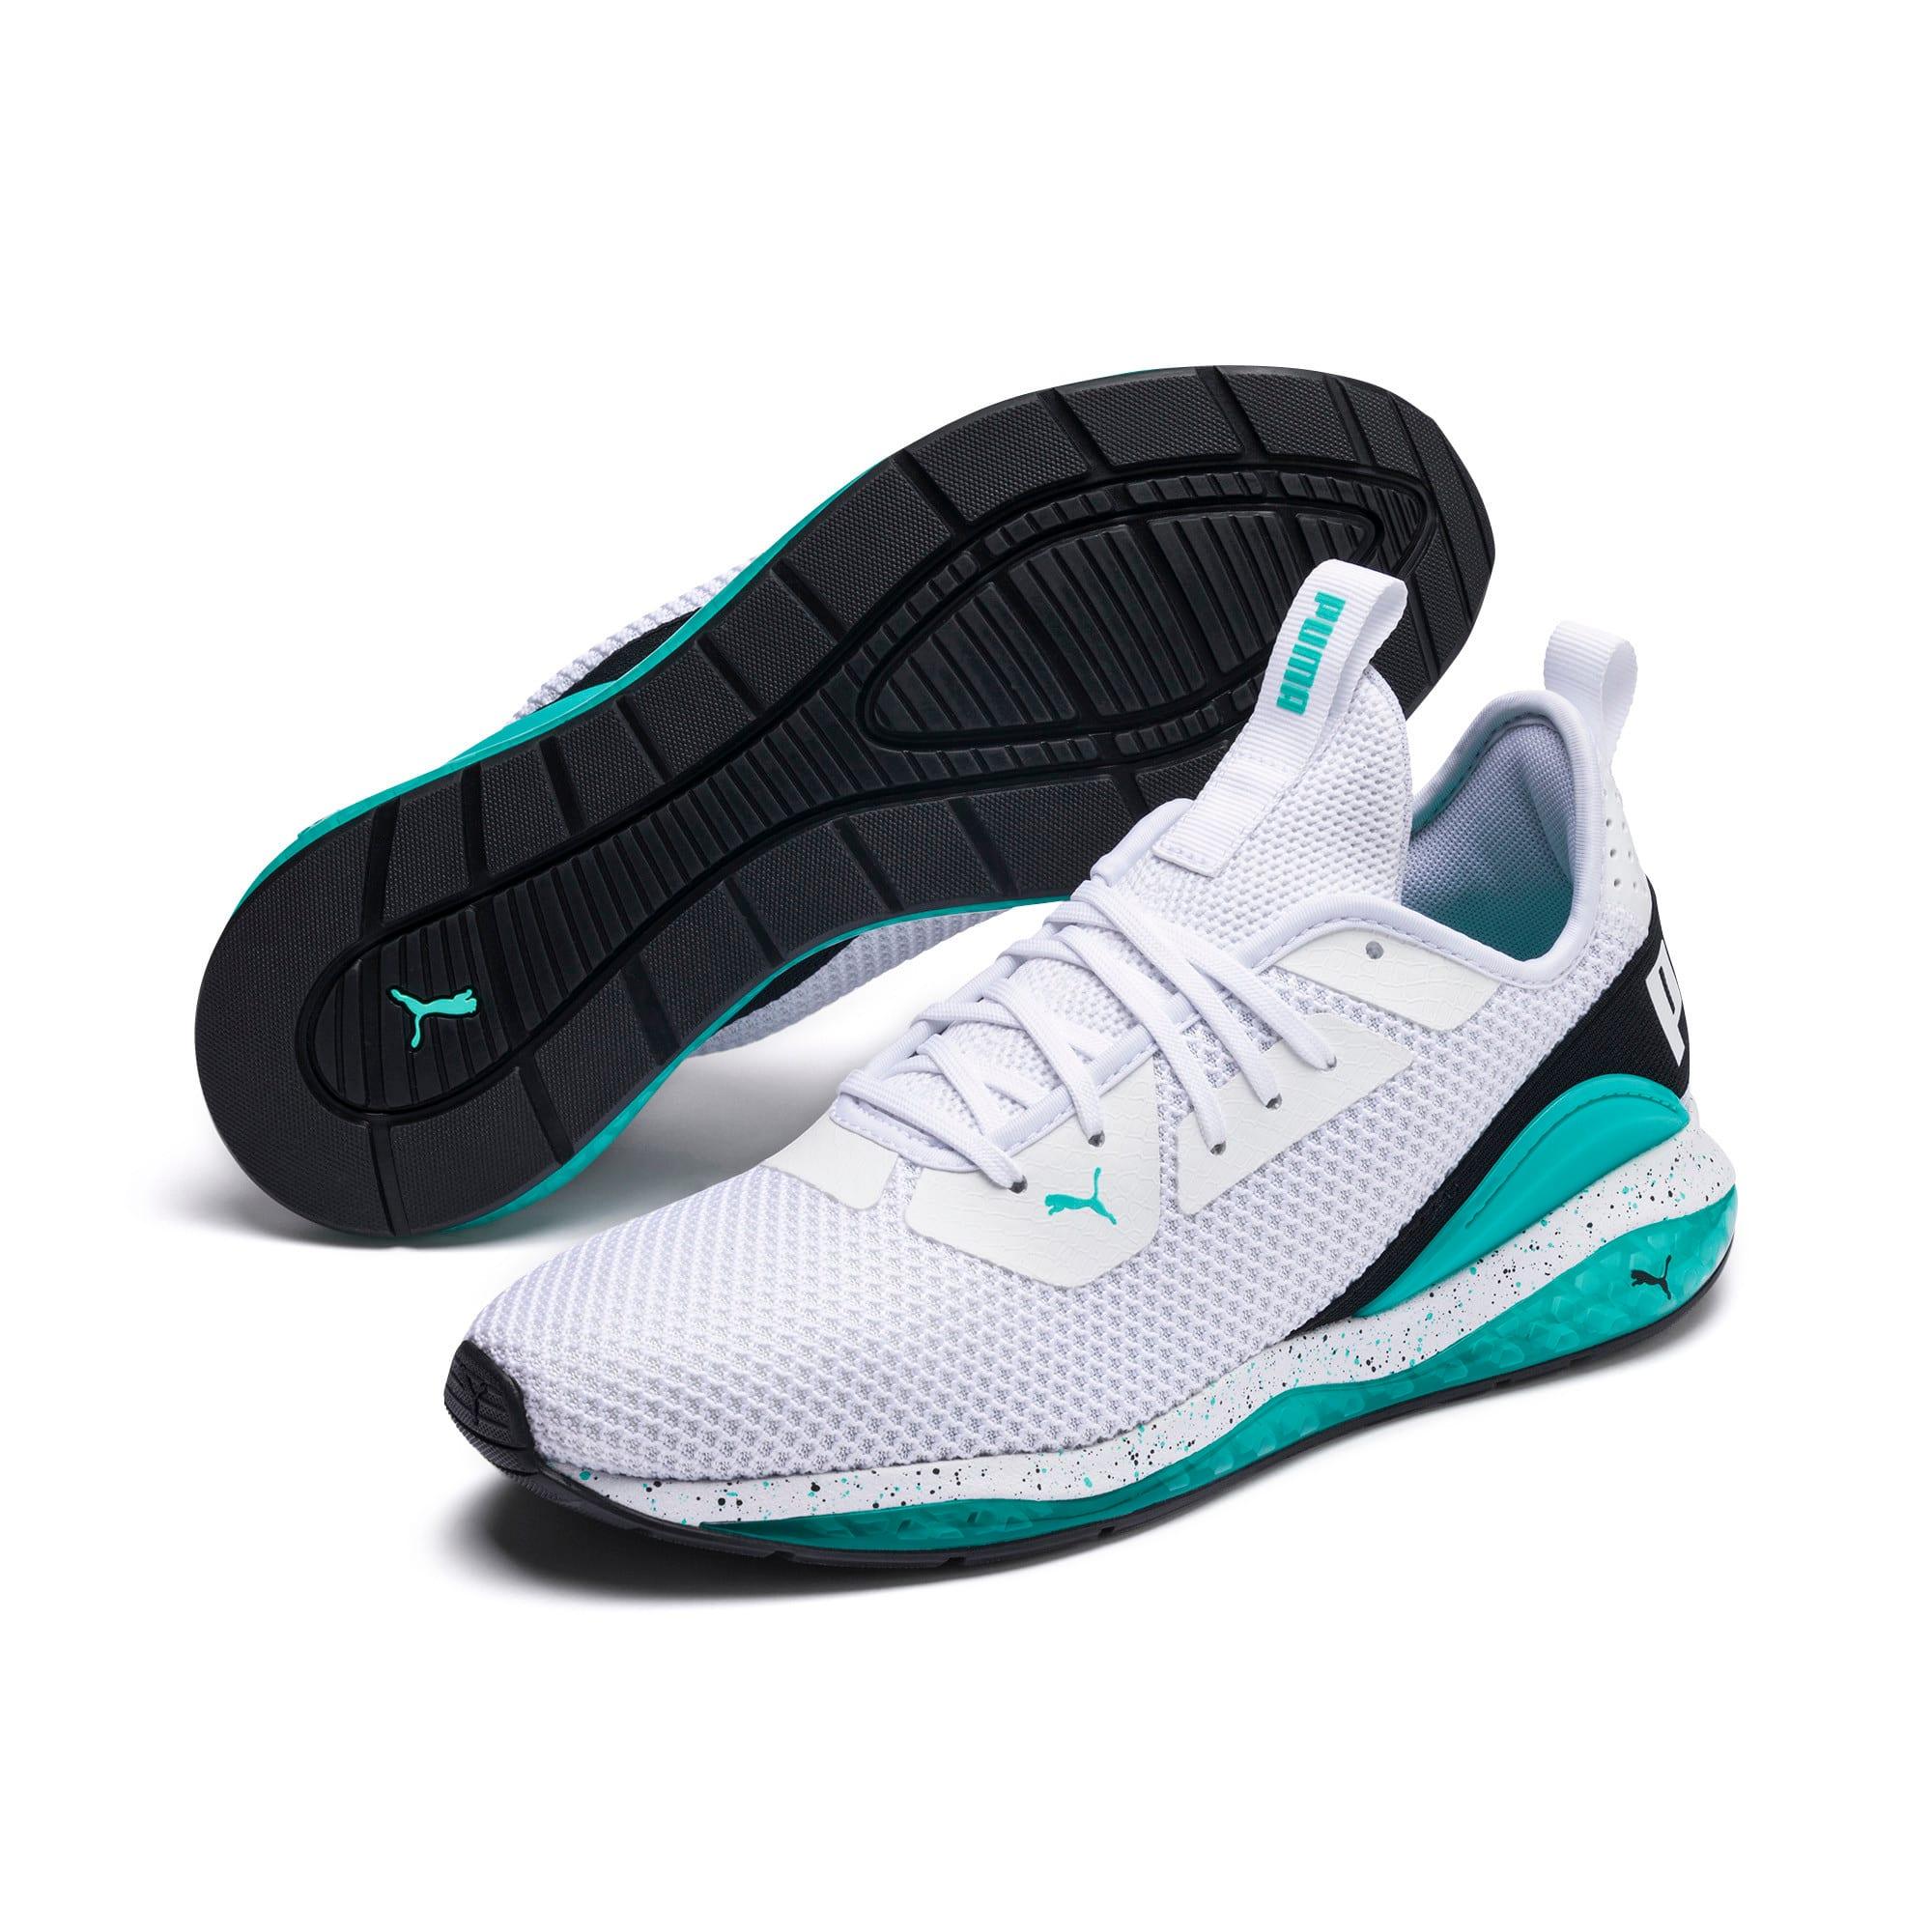 Miniatura 2 de Zapatos de entrenamiento CELL Descend Weave para hombre, White-Black-Blue Turquoise, mediano